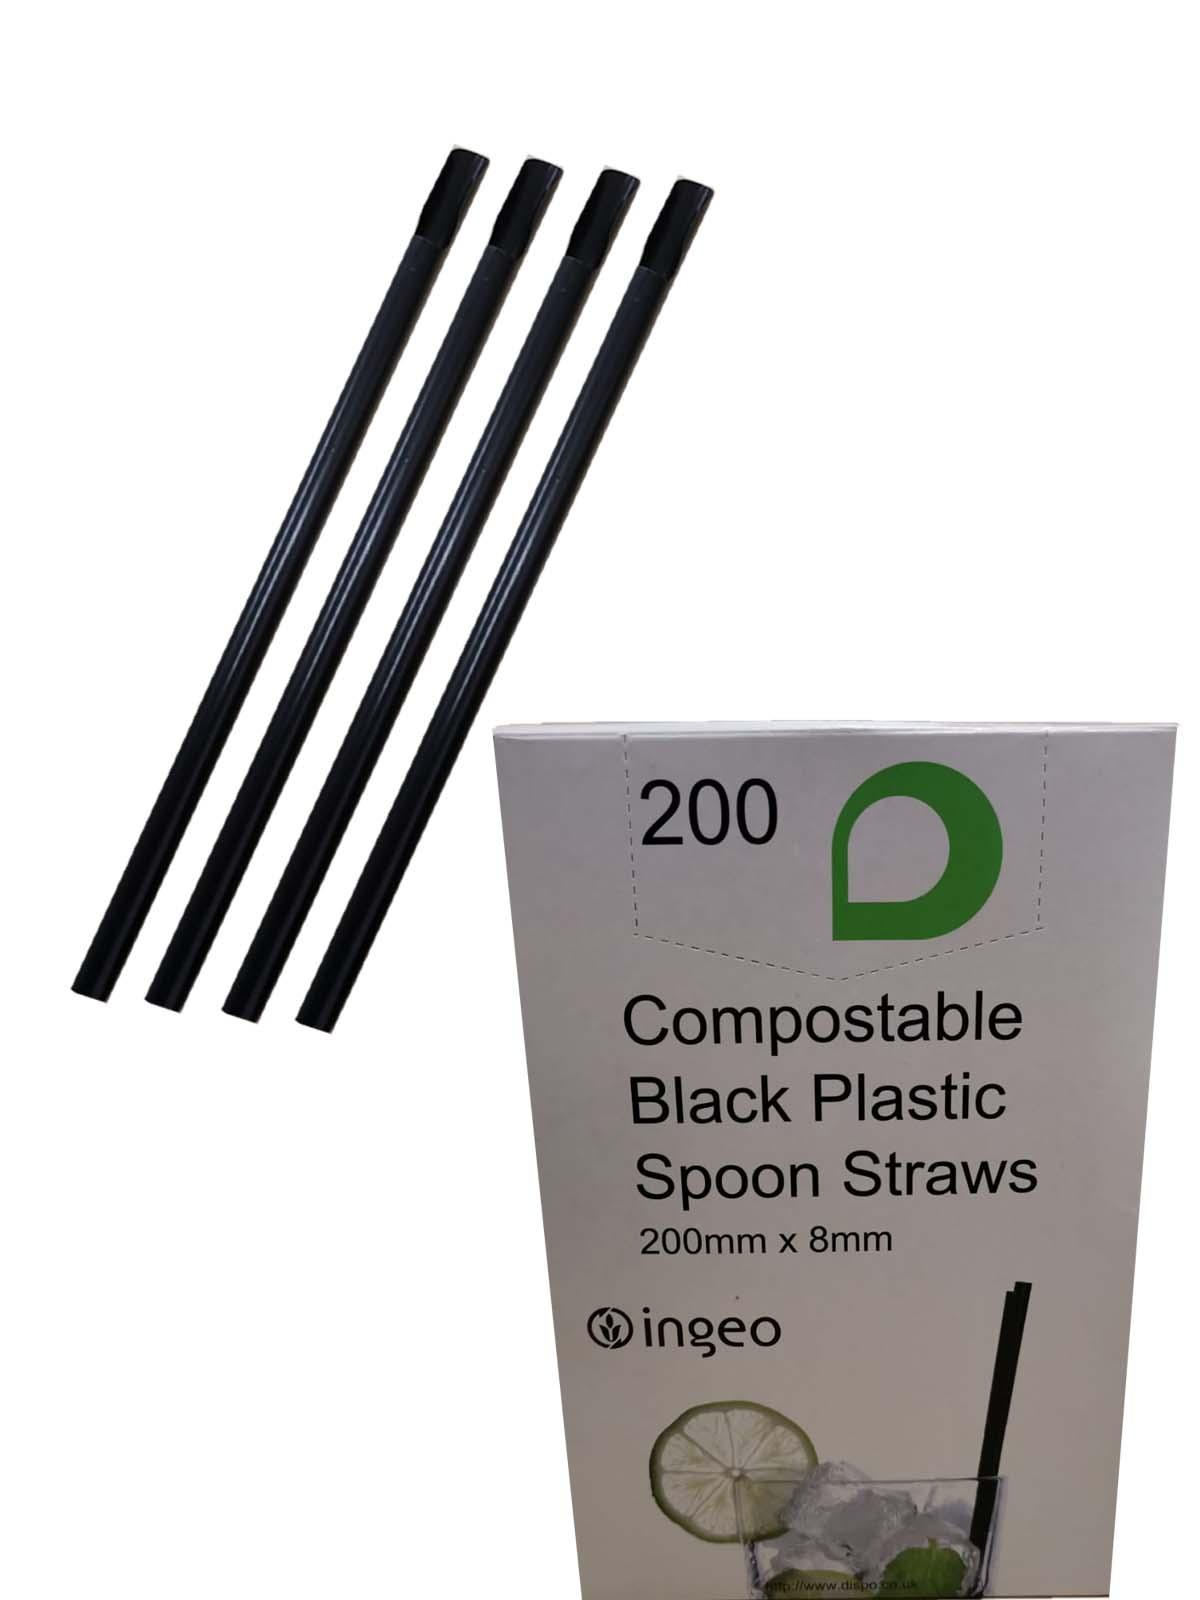 BLACK PLASTIC SPOON STRAWS  (200x8mm) 200's COMPOSTABLE